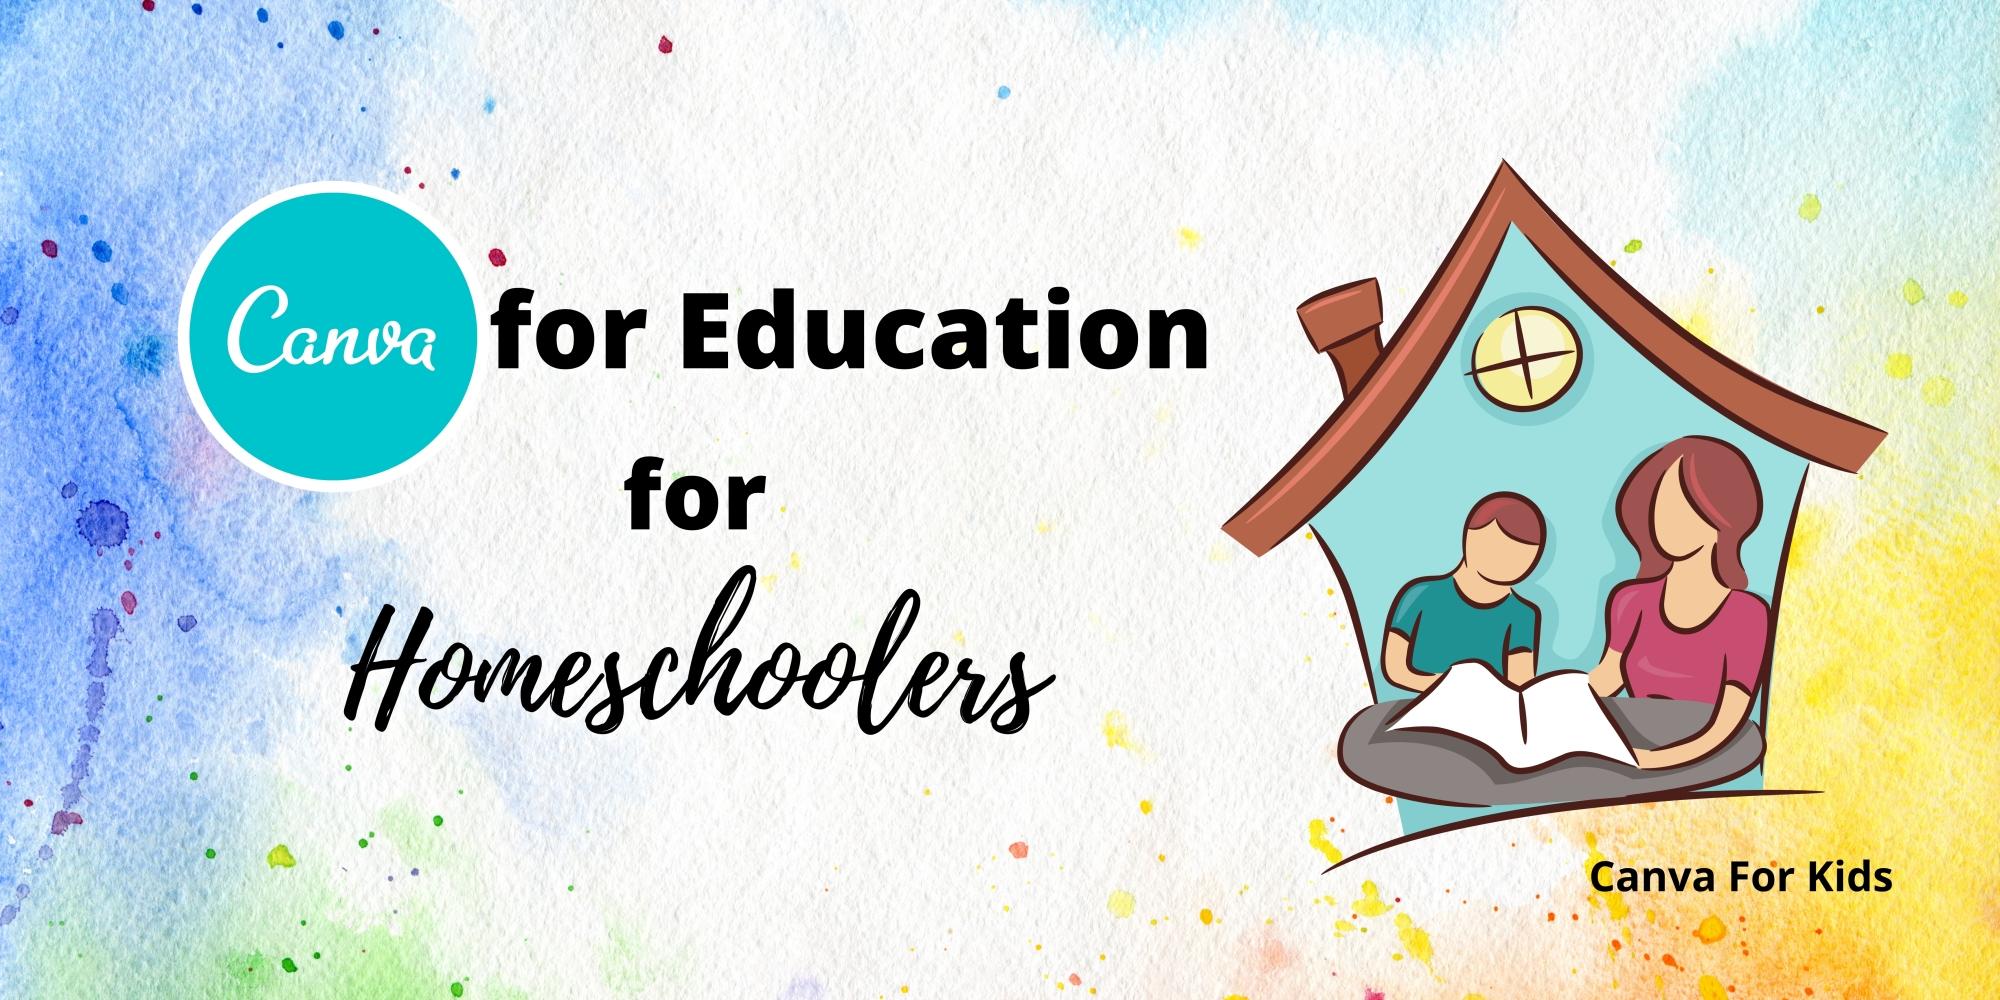 Canva for homeschoolers